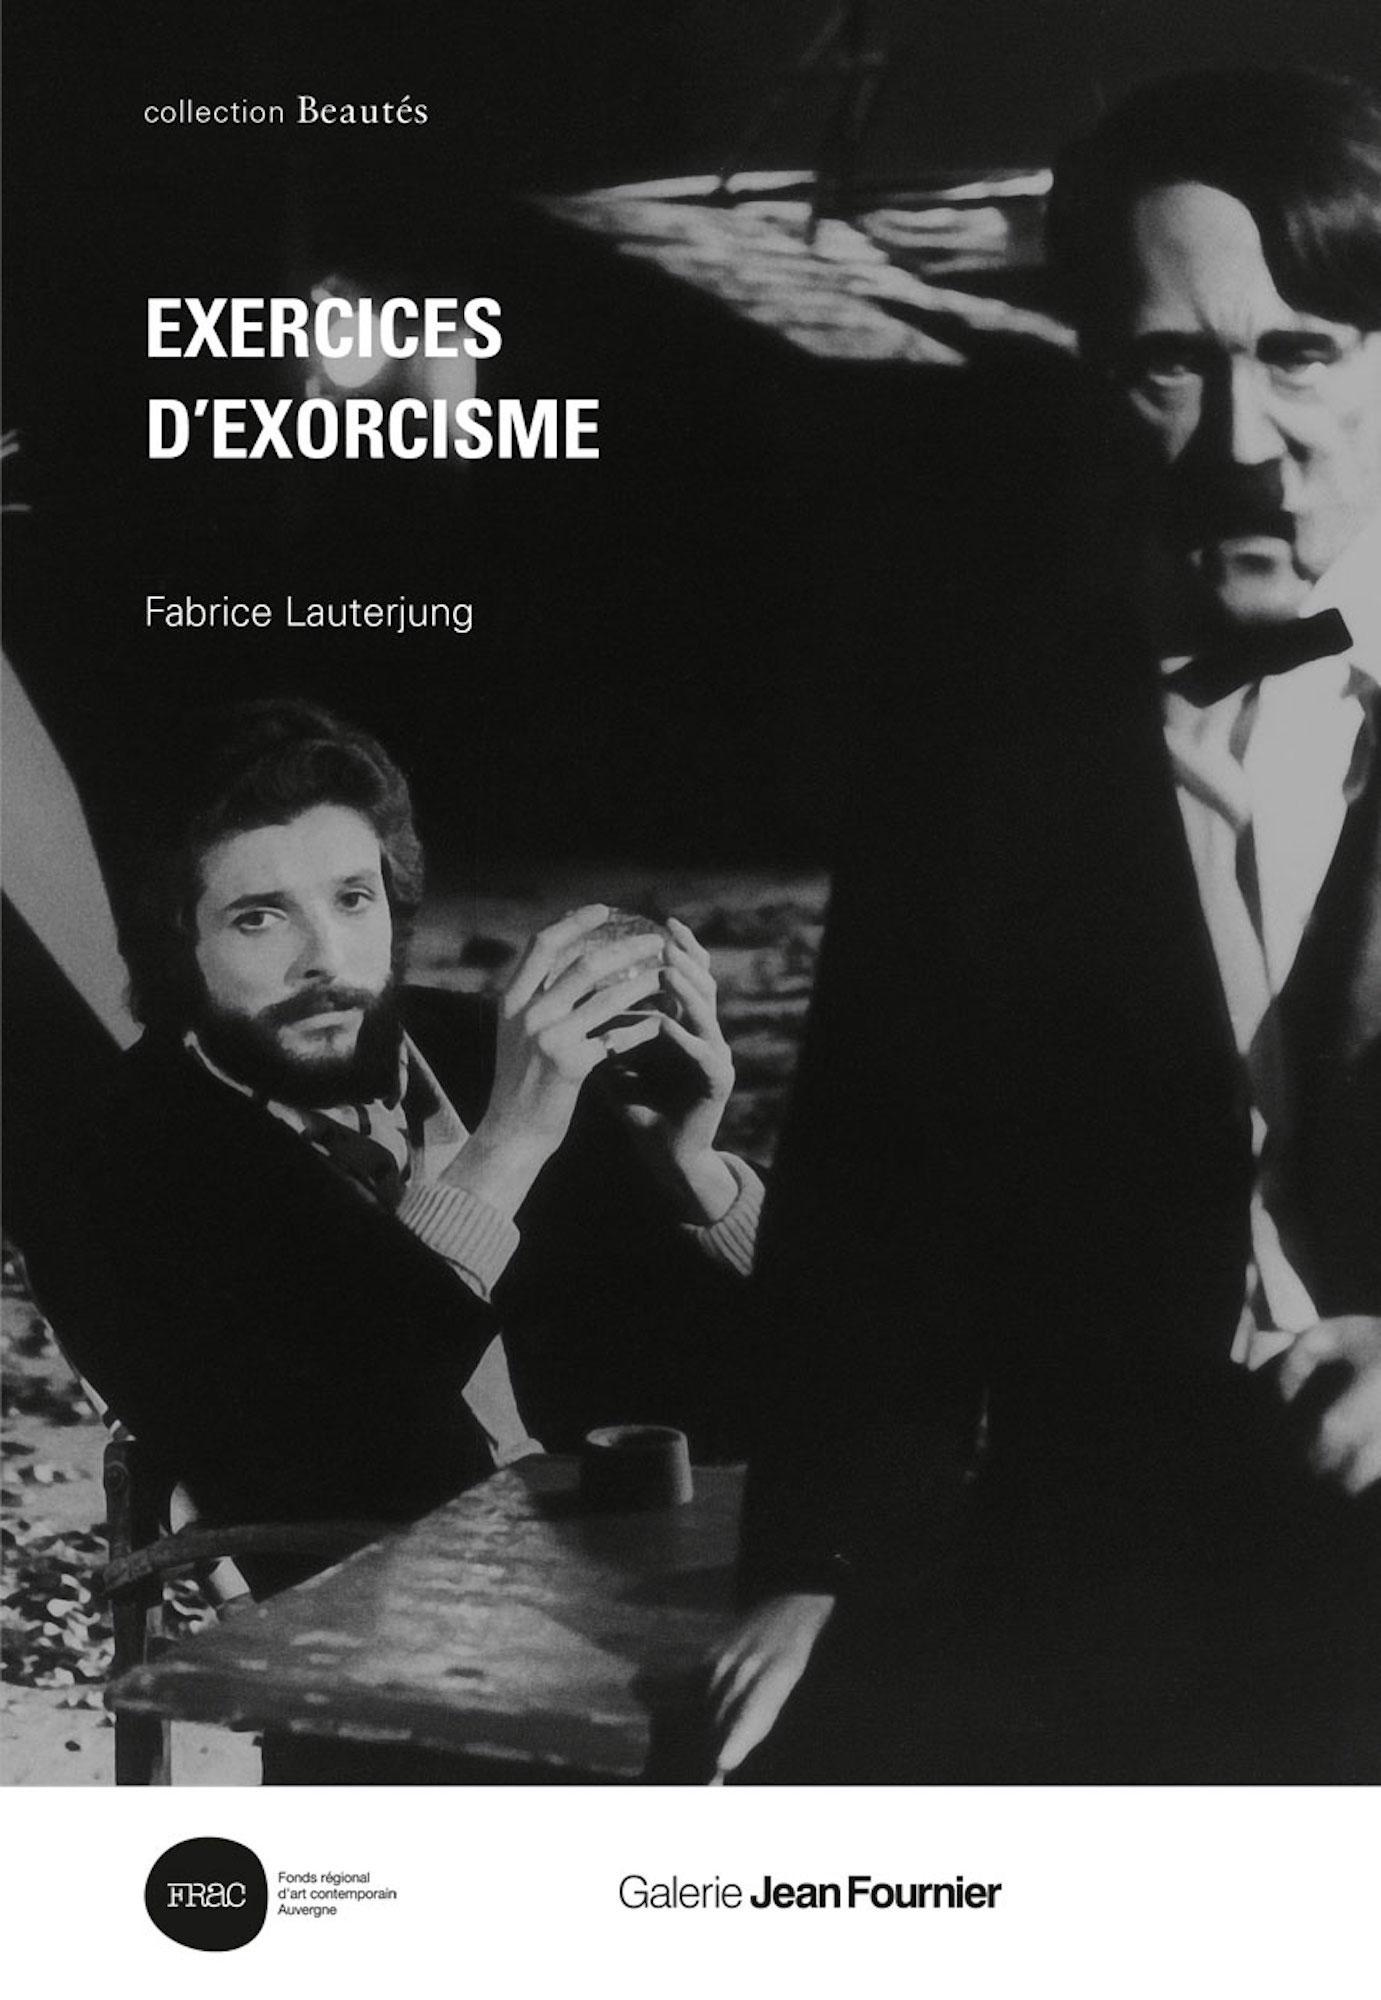 Exercices d'exorcisme